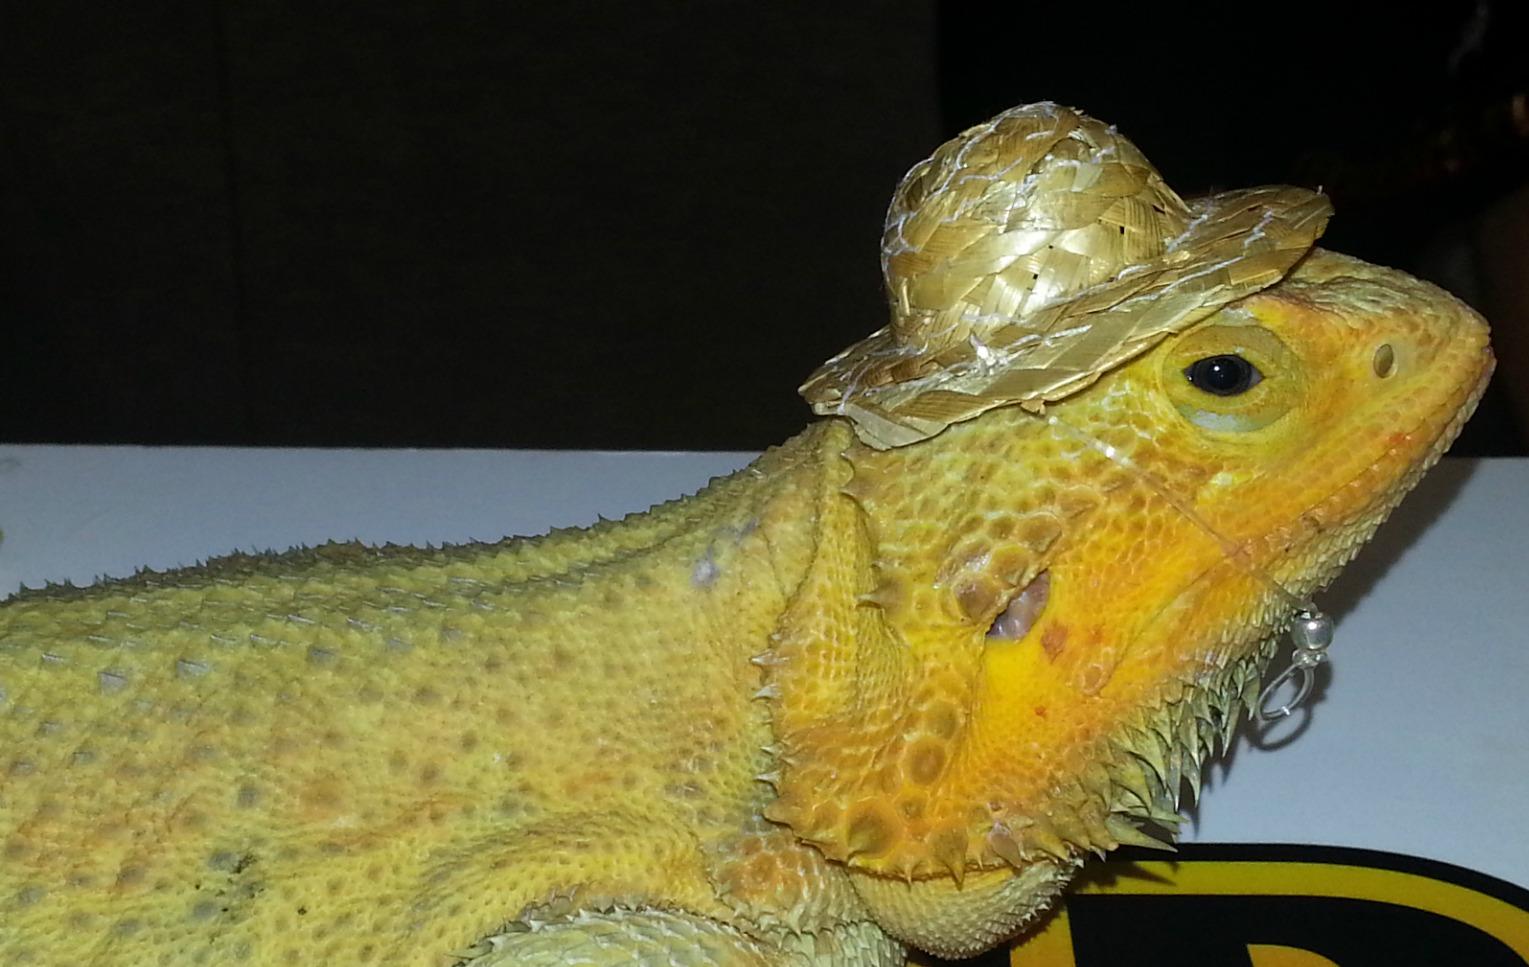 Repticon 2014 Reptiles And Exotic Pets Take Center Stage